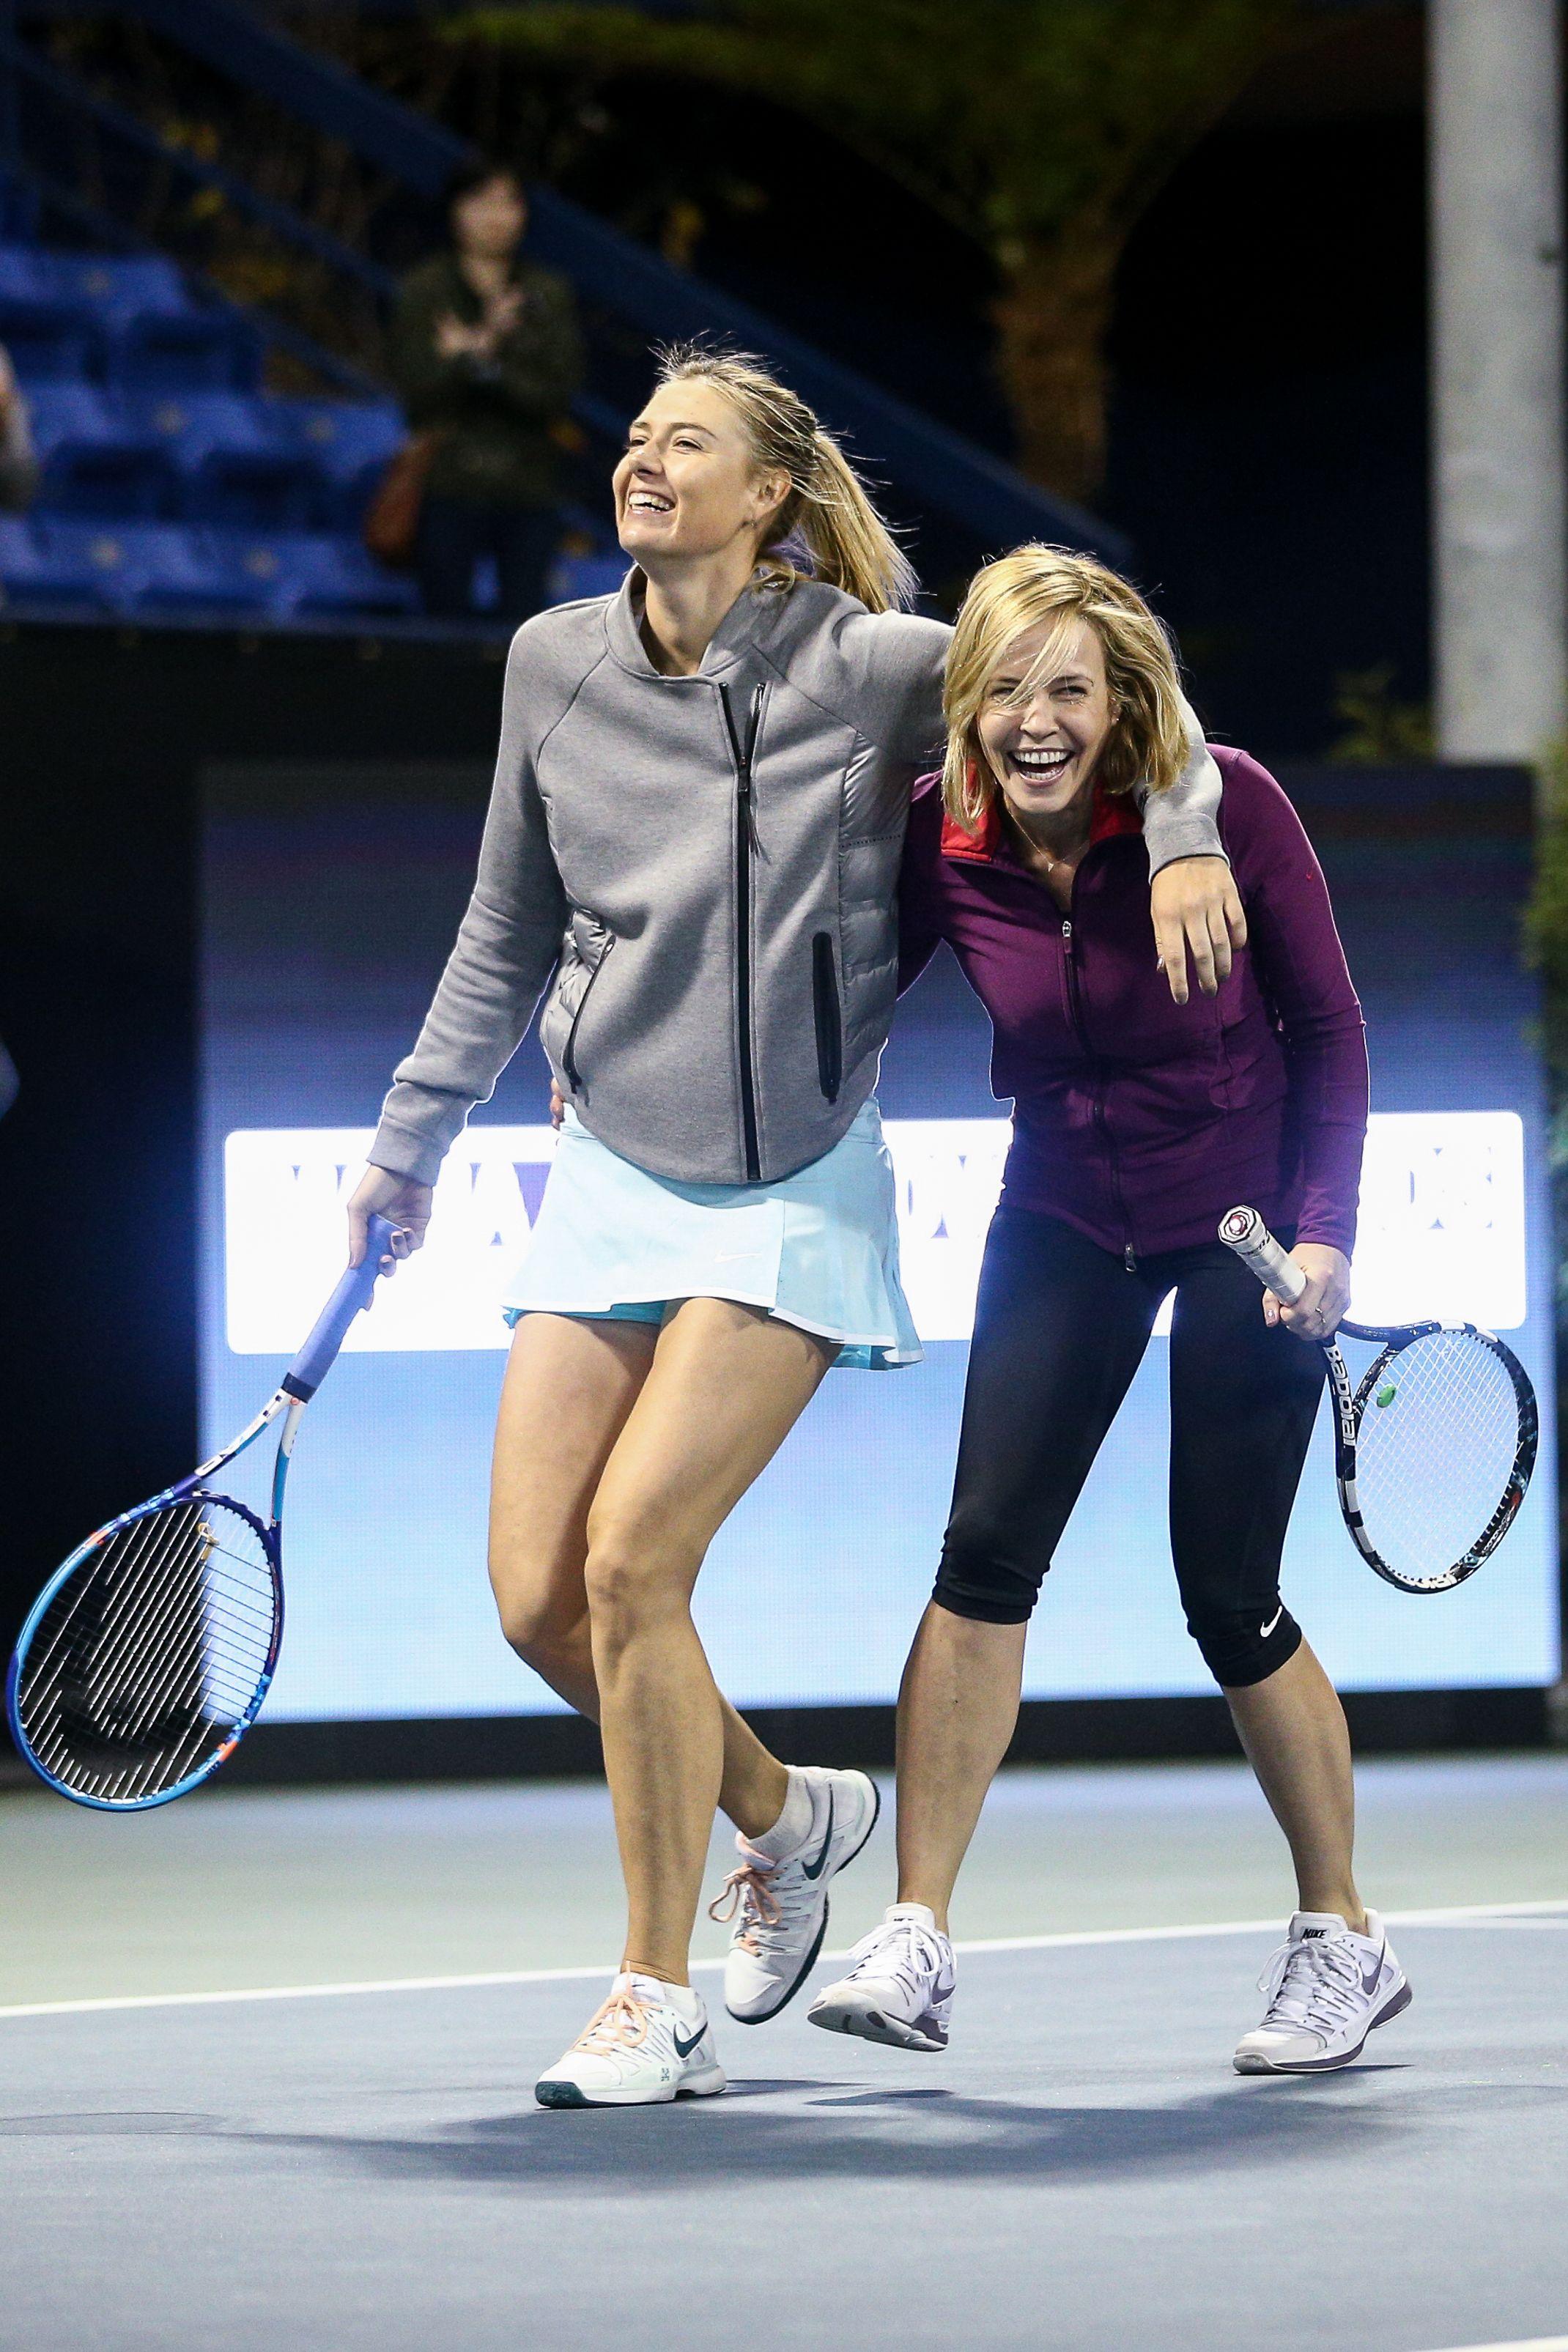 Maria Sharapova & Friends Tennis Event, Day 1, Los Angeles, America - 12 Dec 2015